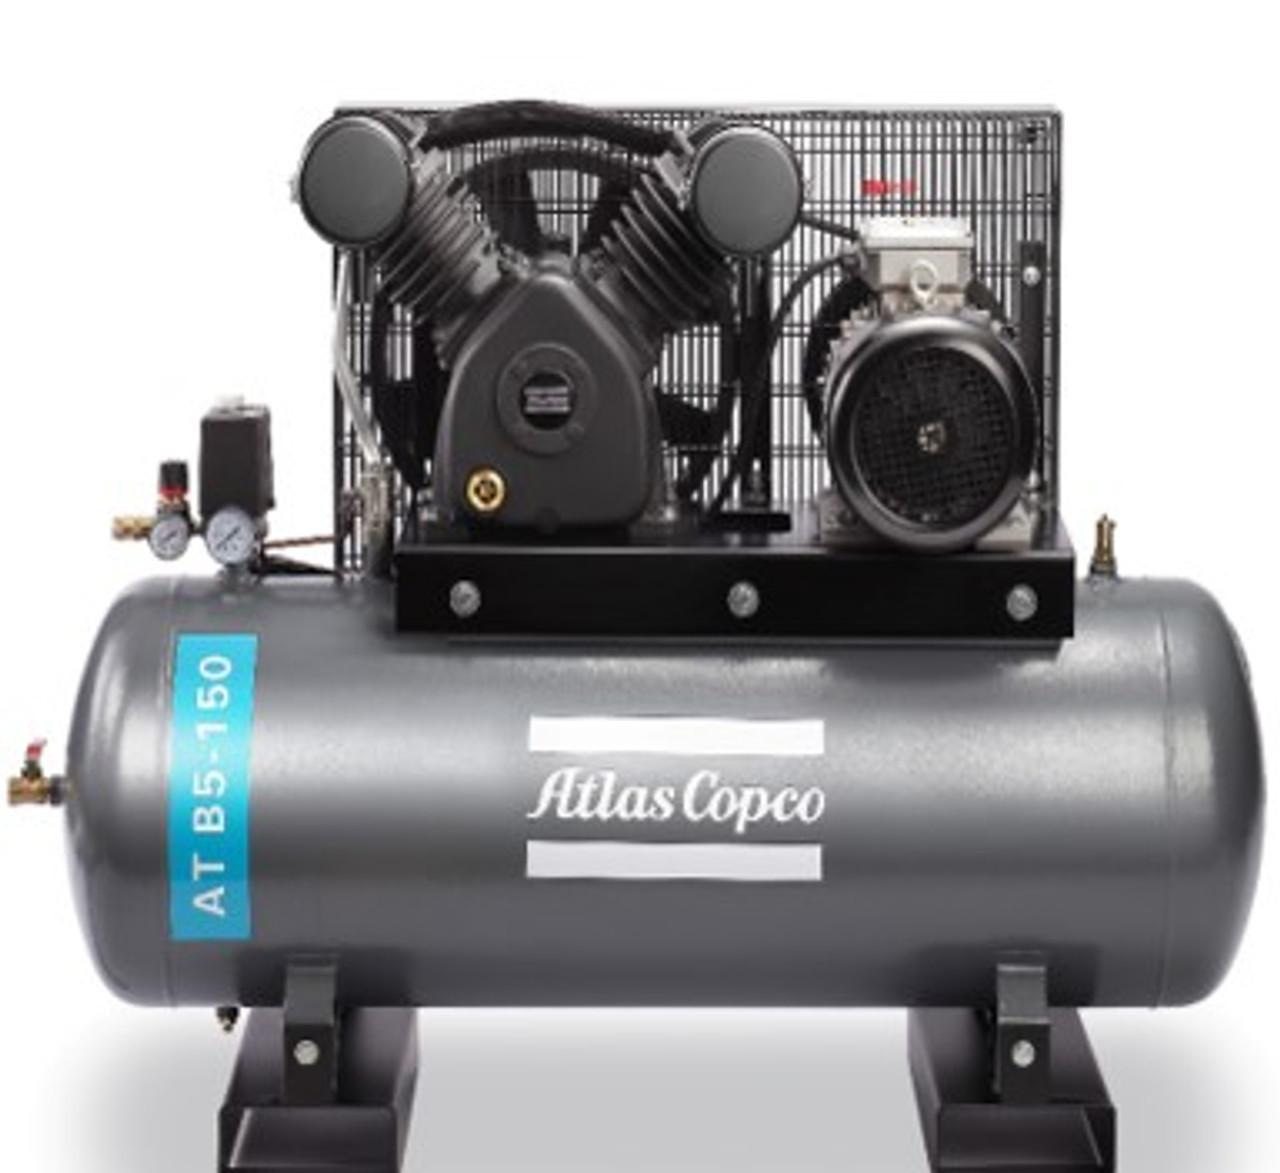 Atlas Copco Piston Air Compressor - 5.5HP, 25.4CFM, 150L